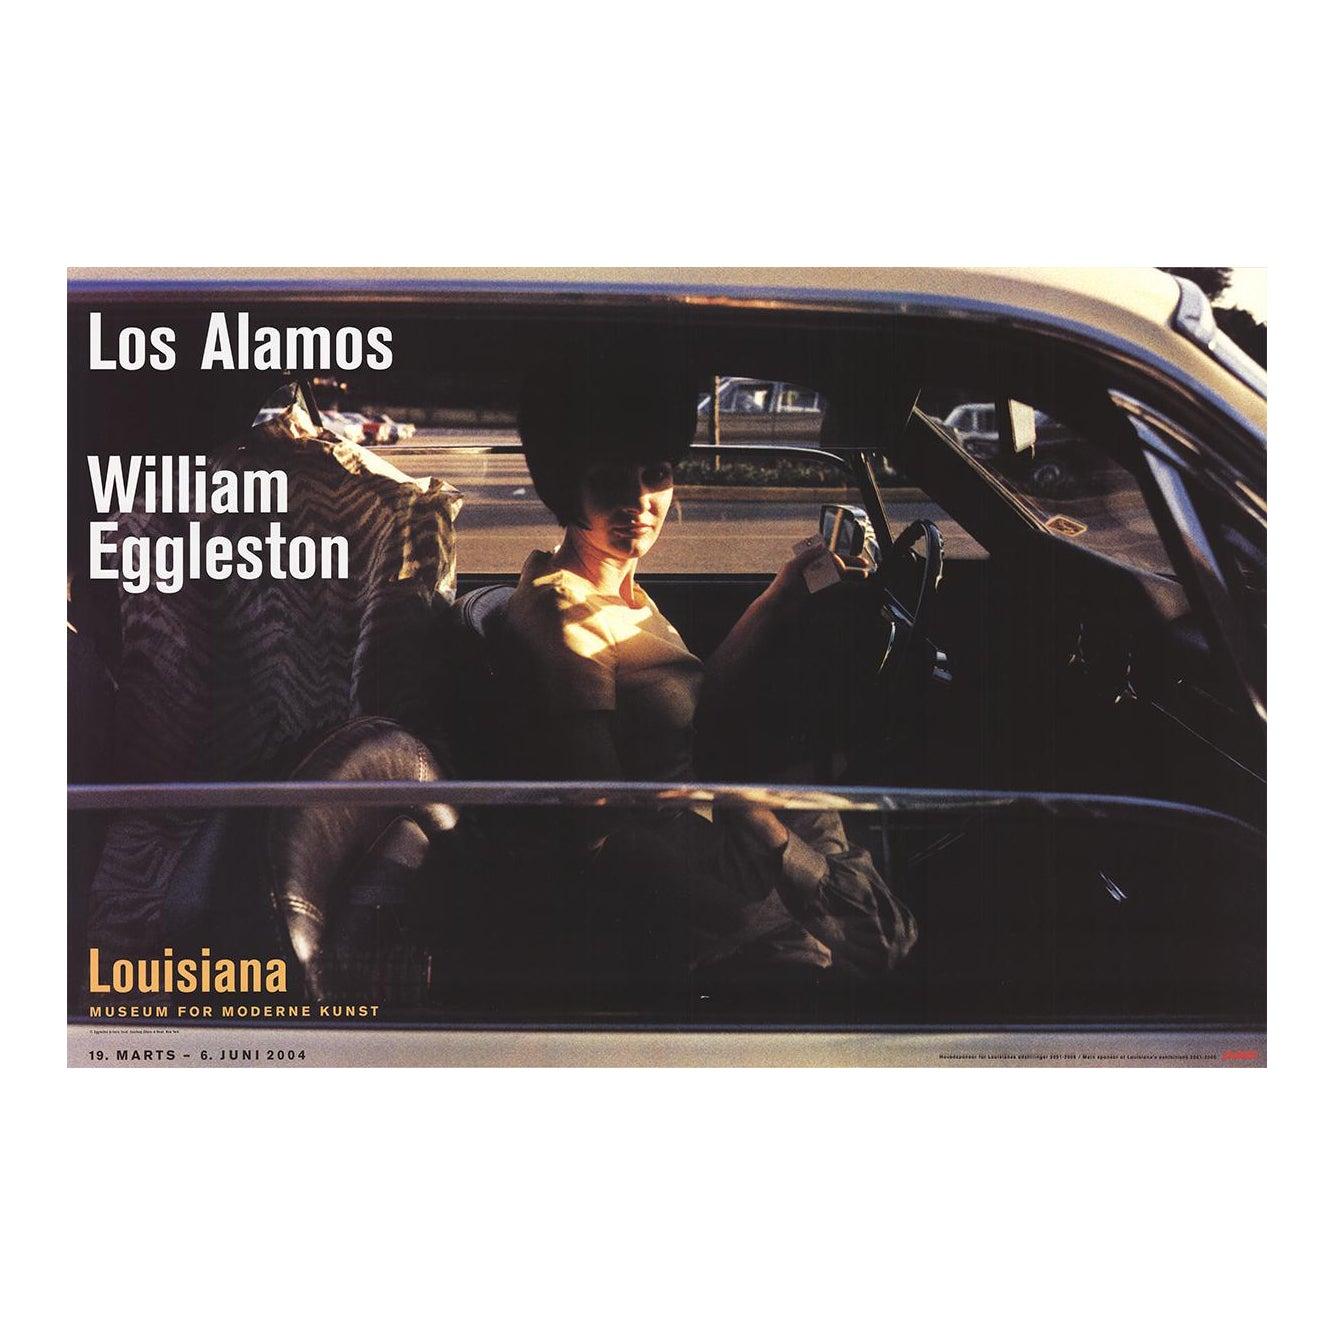 William Eggleston-Los Alamos-2014 Poster